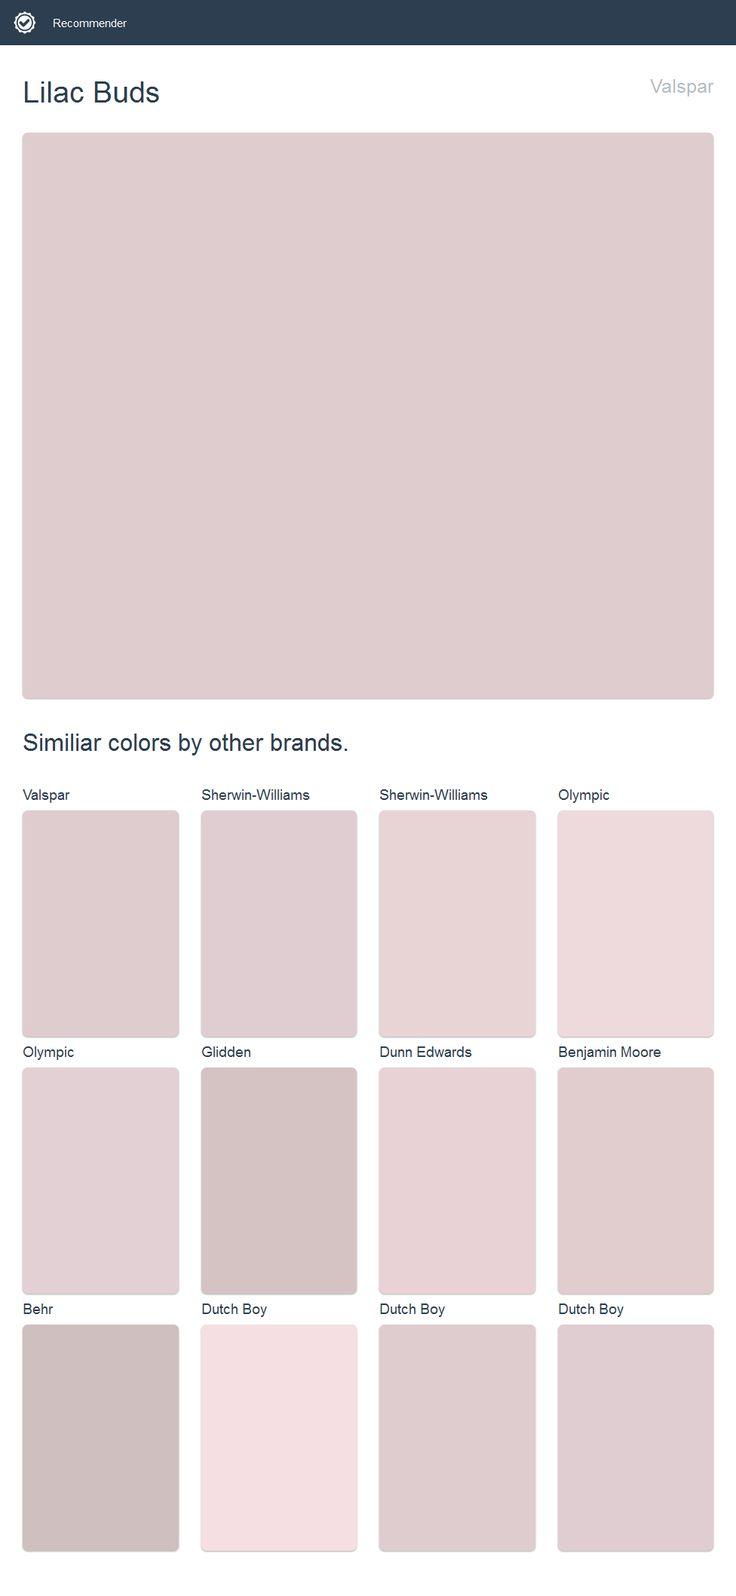 Lilac Buds Valspar 2017 Valspar Paint Pinterest